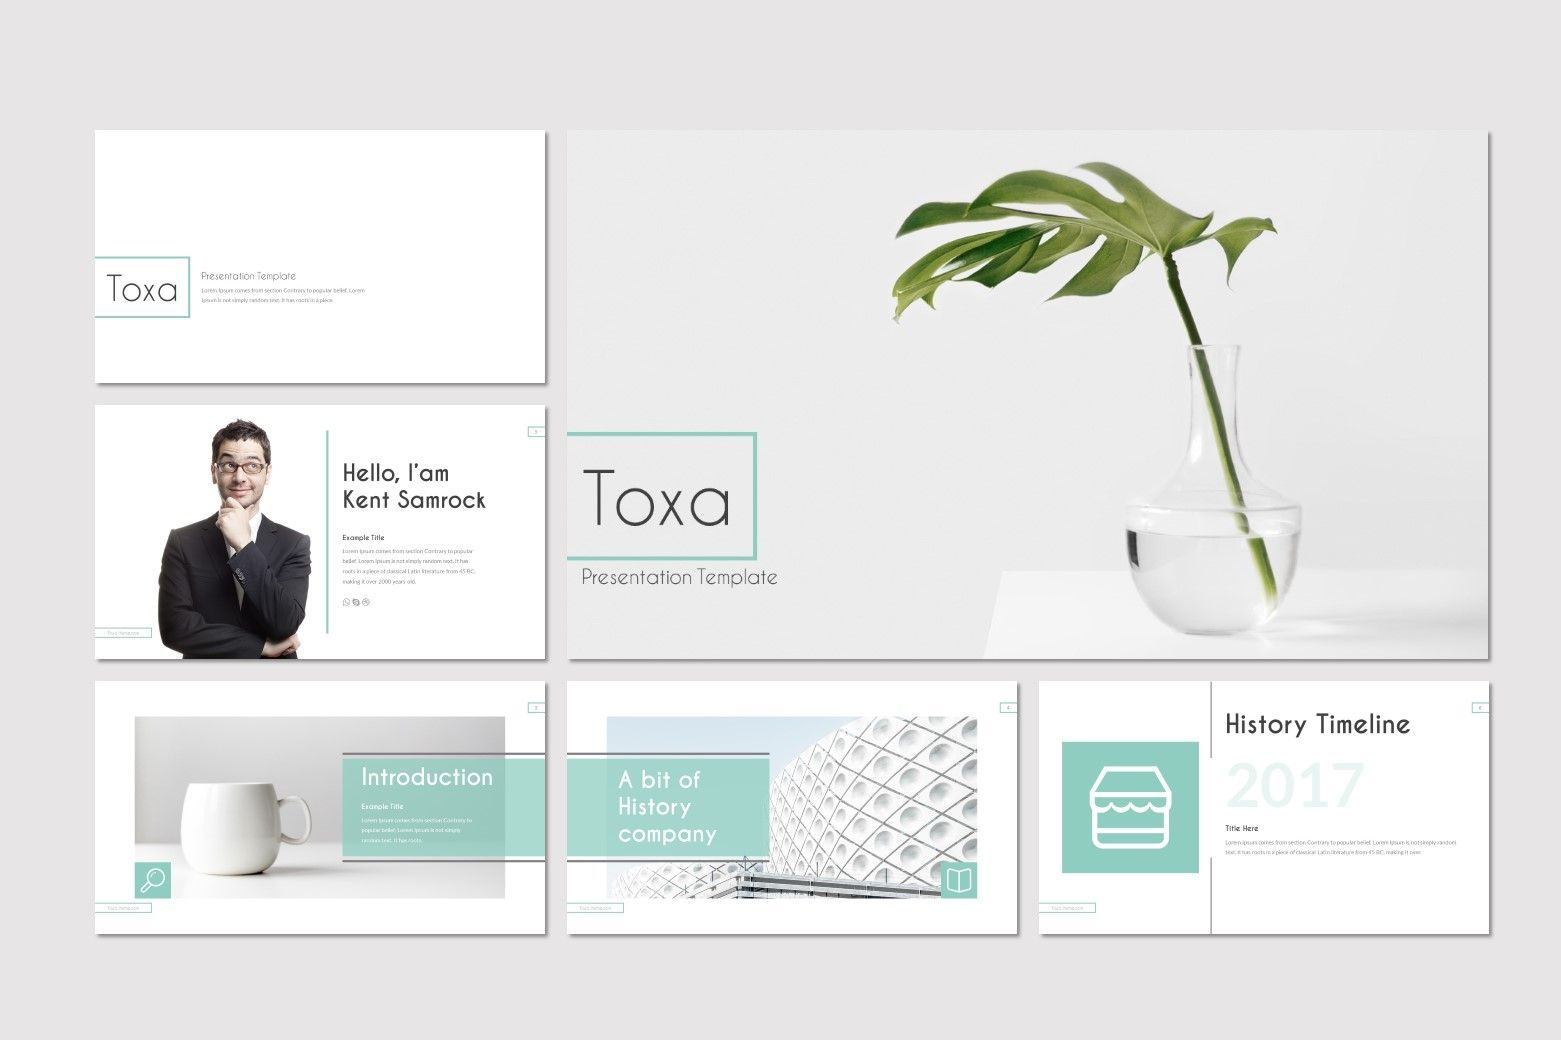 Toxa - PowerPoint Template, Slide 2, 08616, Presentation Templates — PoweredTemplate.com